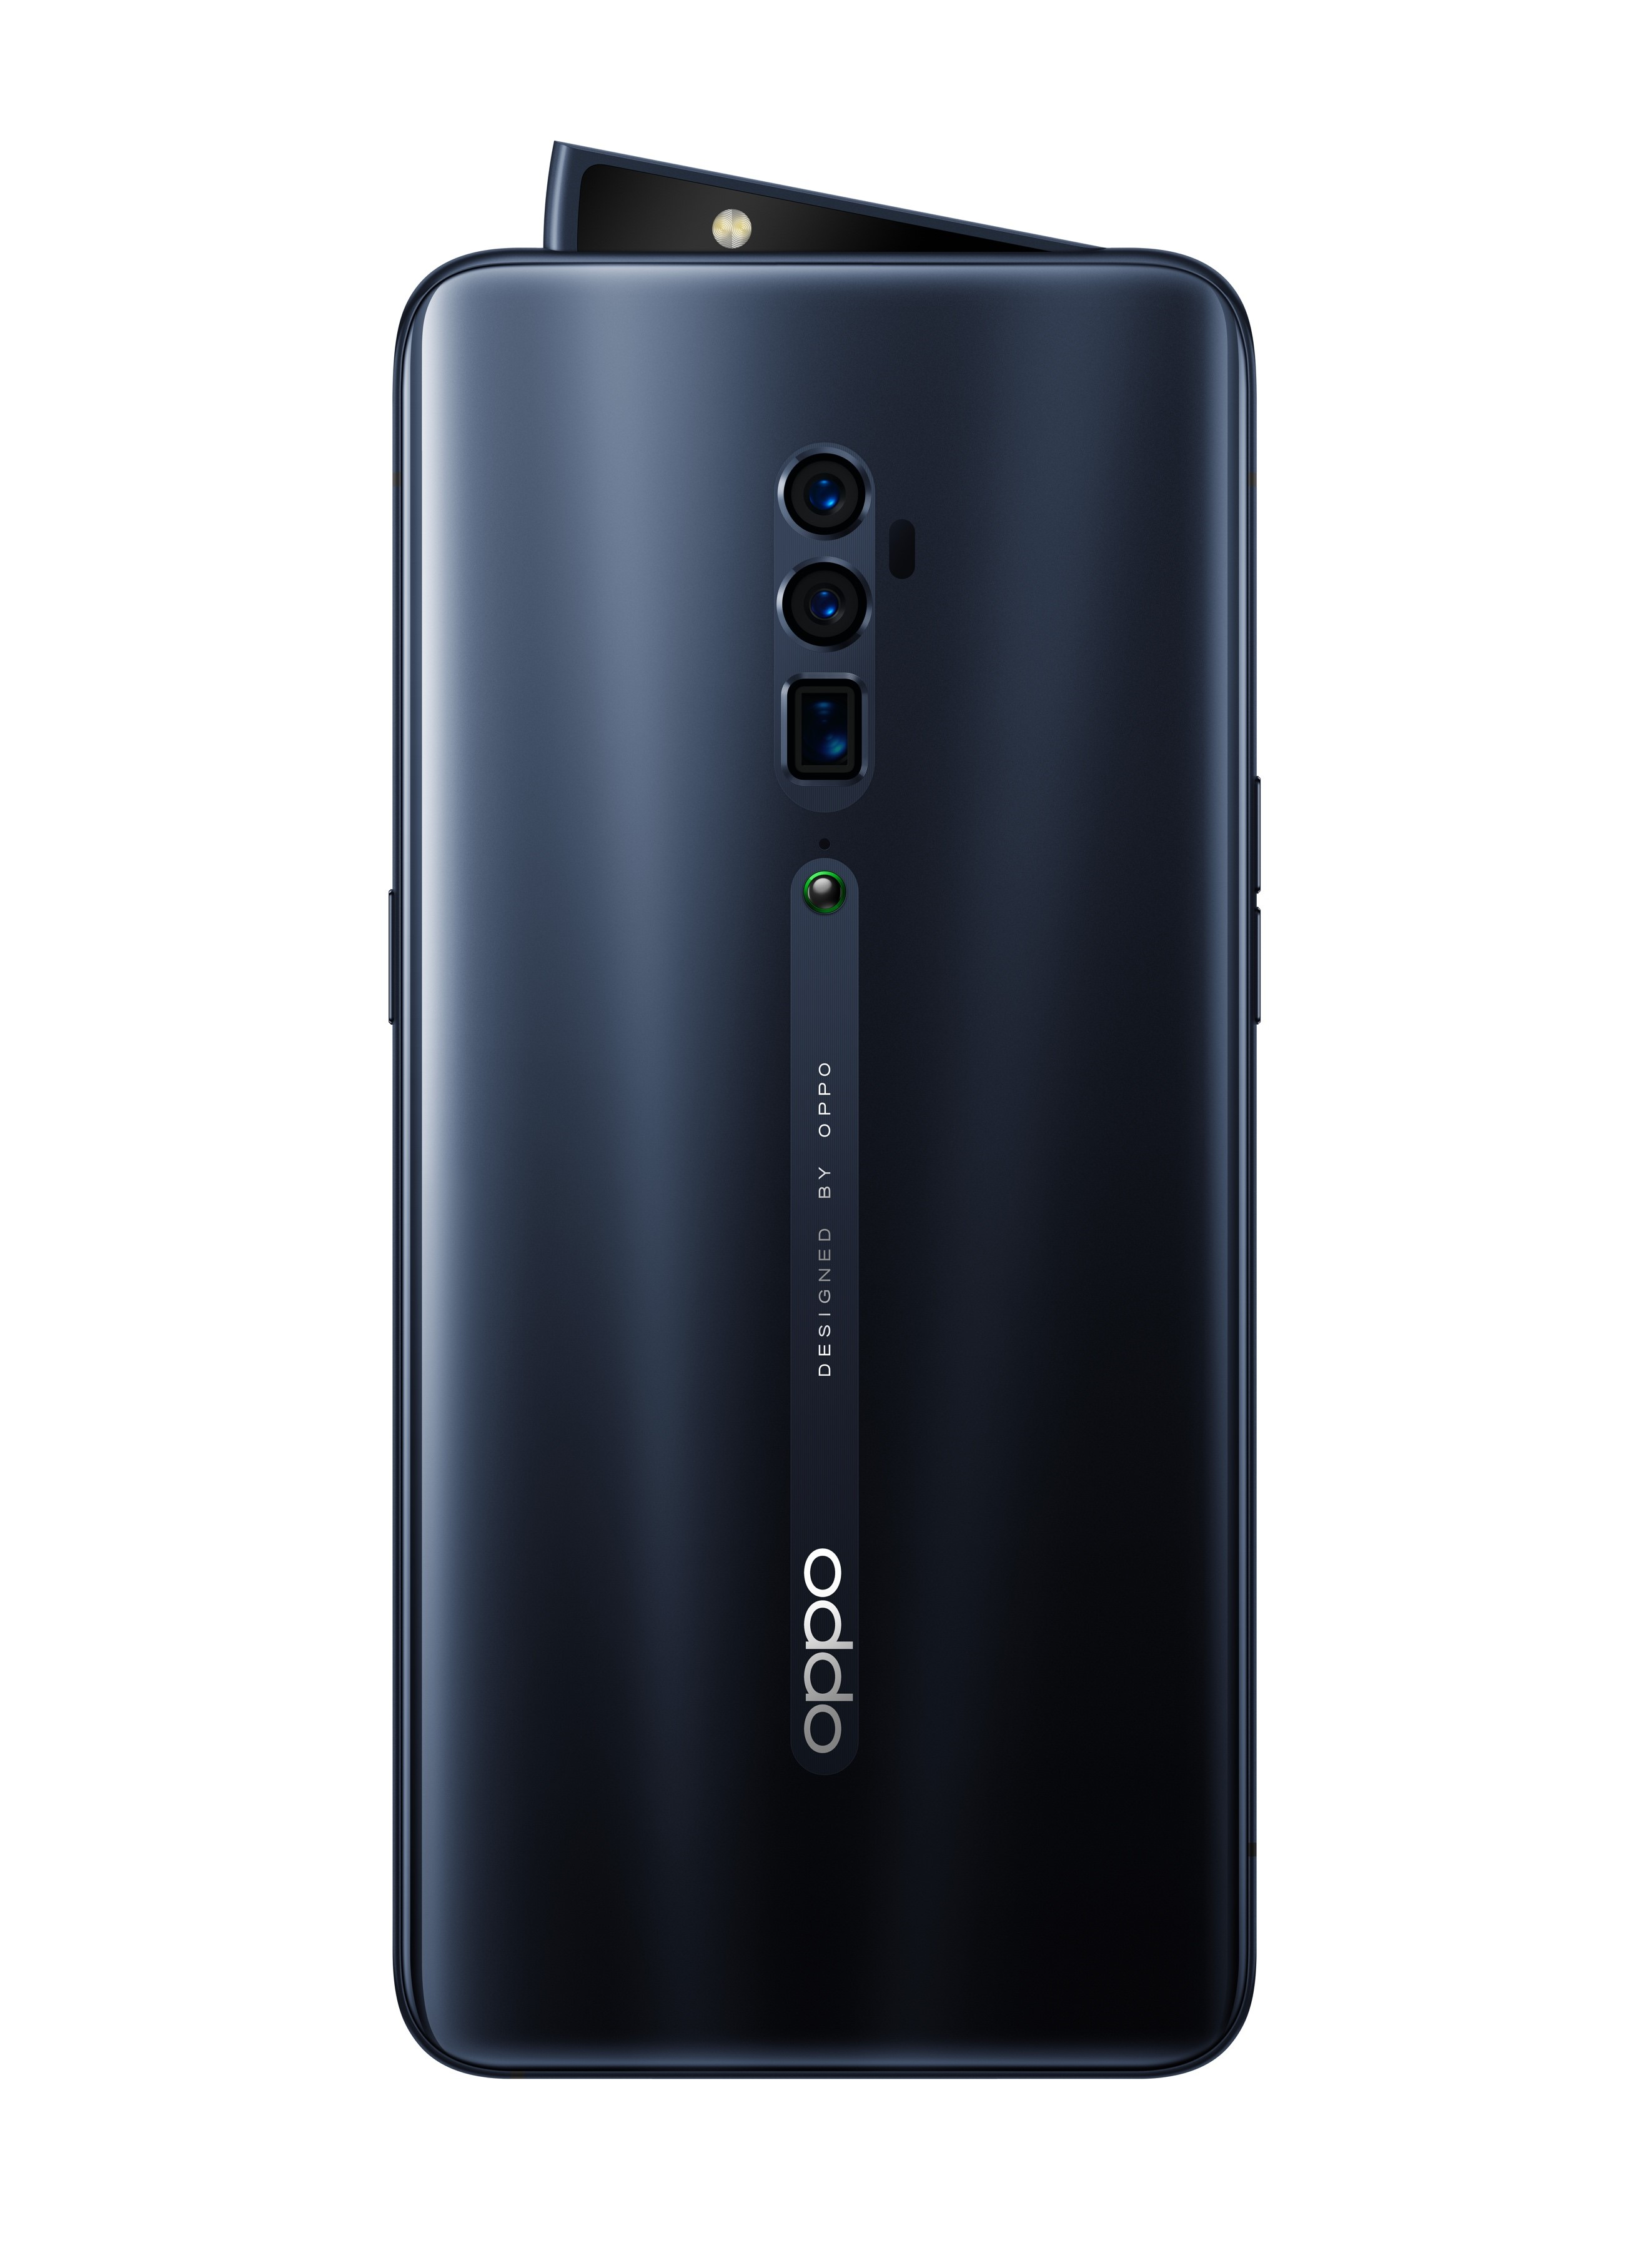 da161948aeb OPPO lanceert de nieuwe Reno smartphone serie | OPPO Nederland